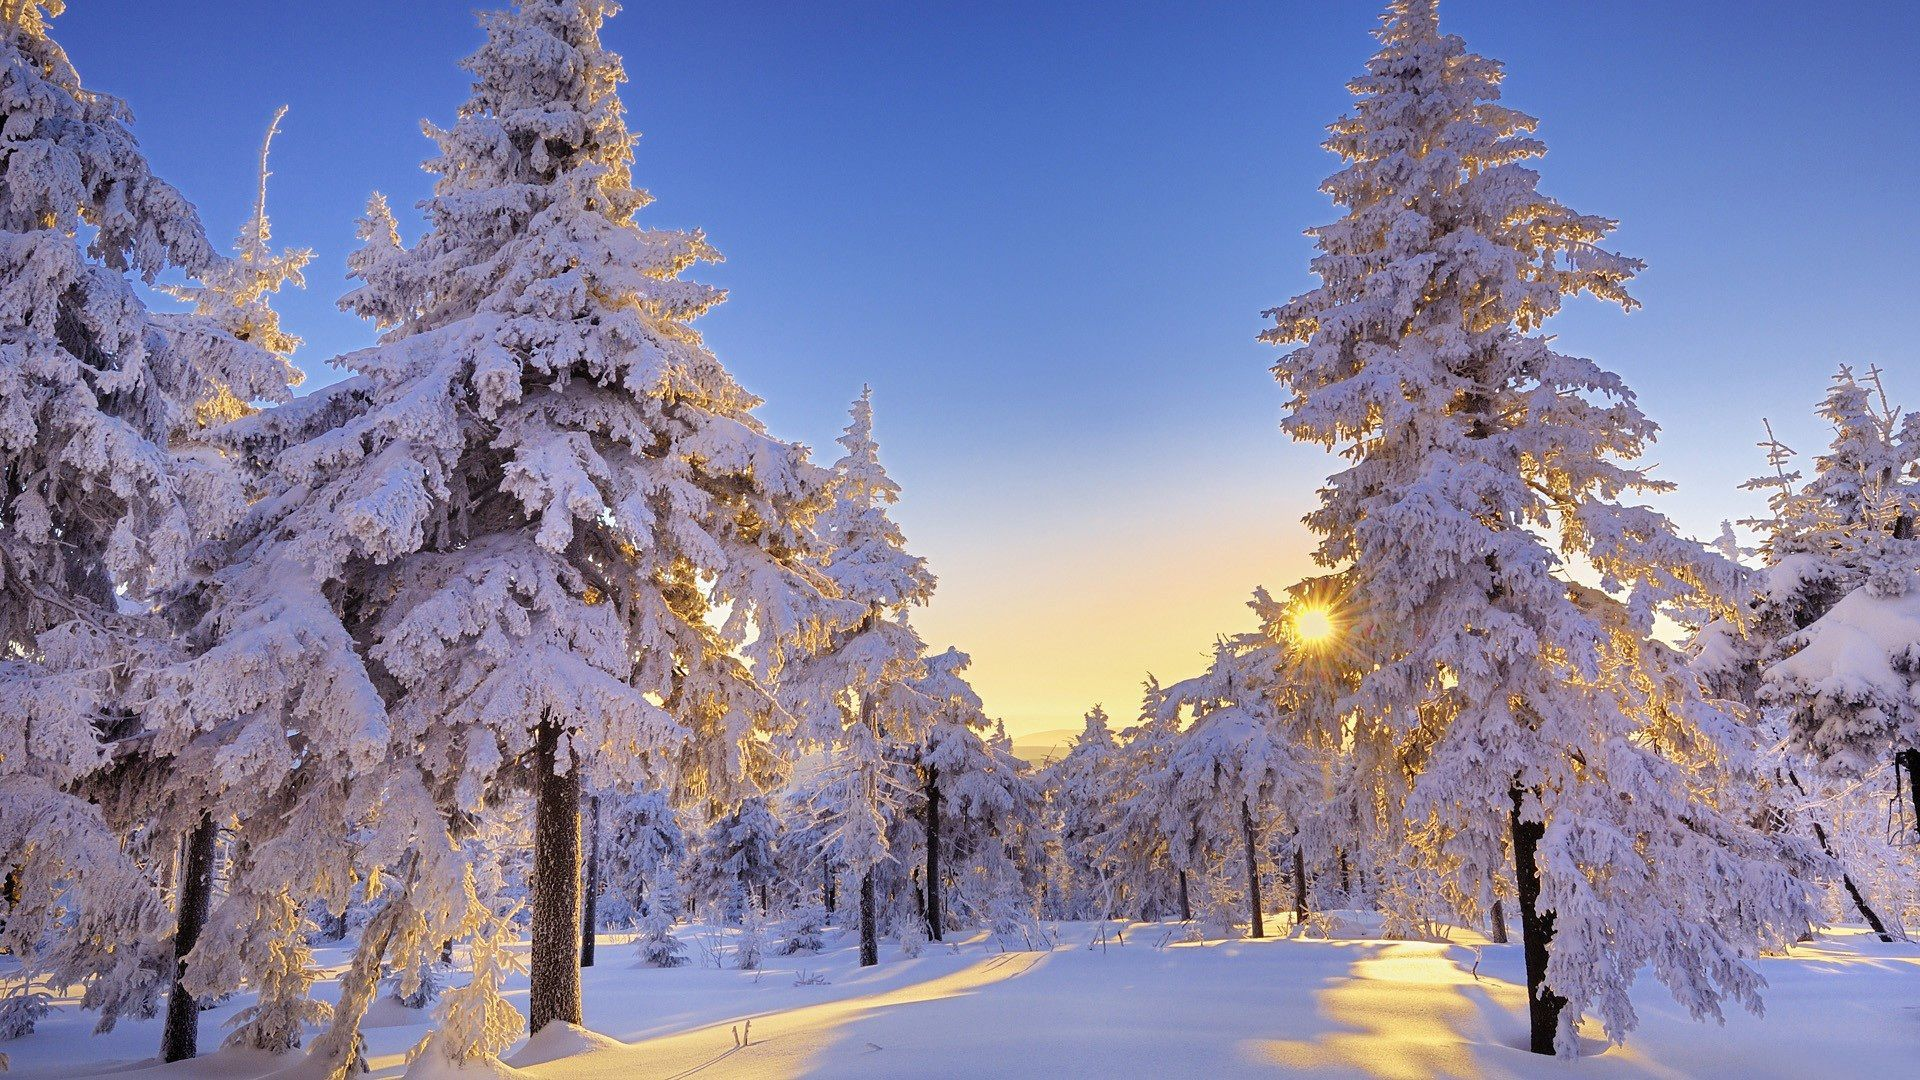 Winter Wonderland A Poem Winter Snow Wallpaper Winter Landscape Winter Wallpaper